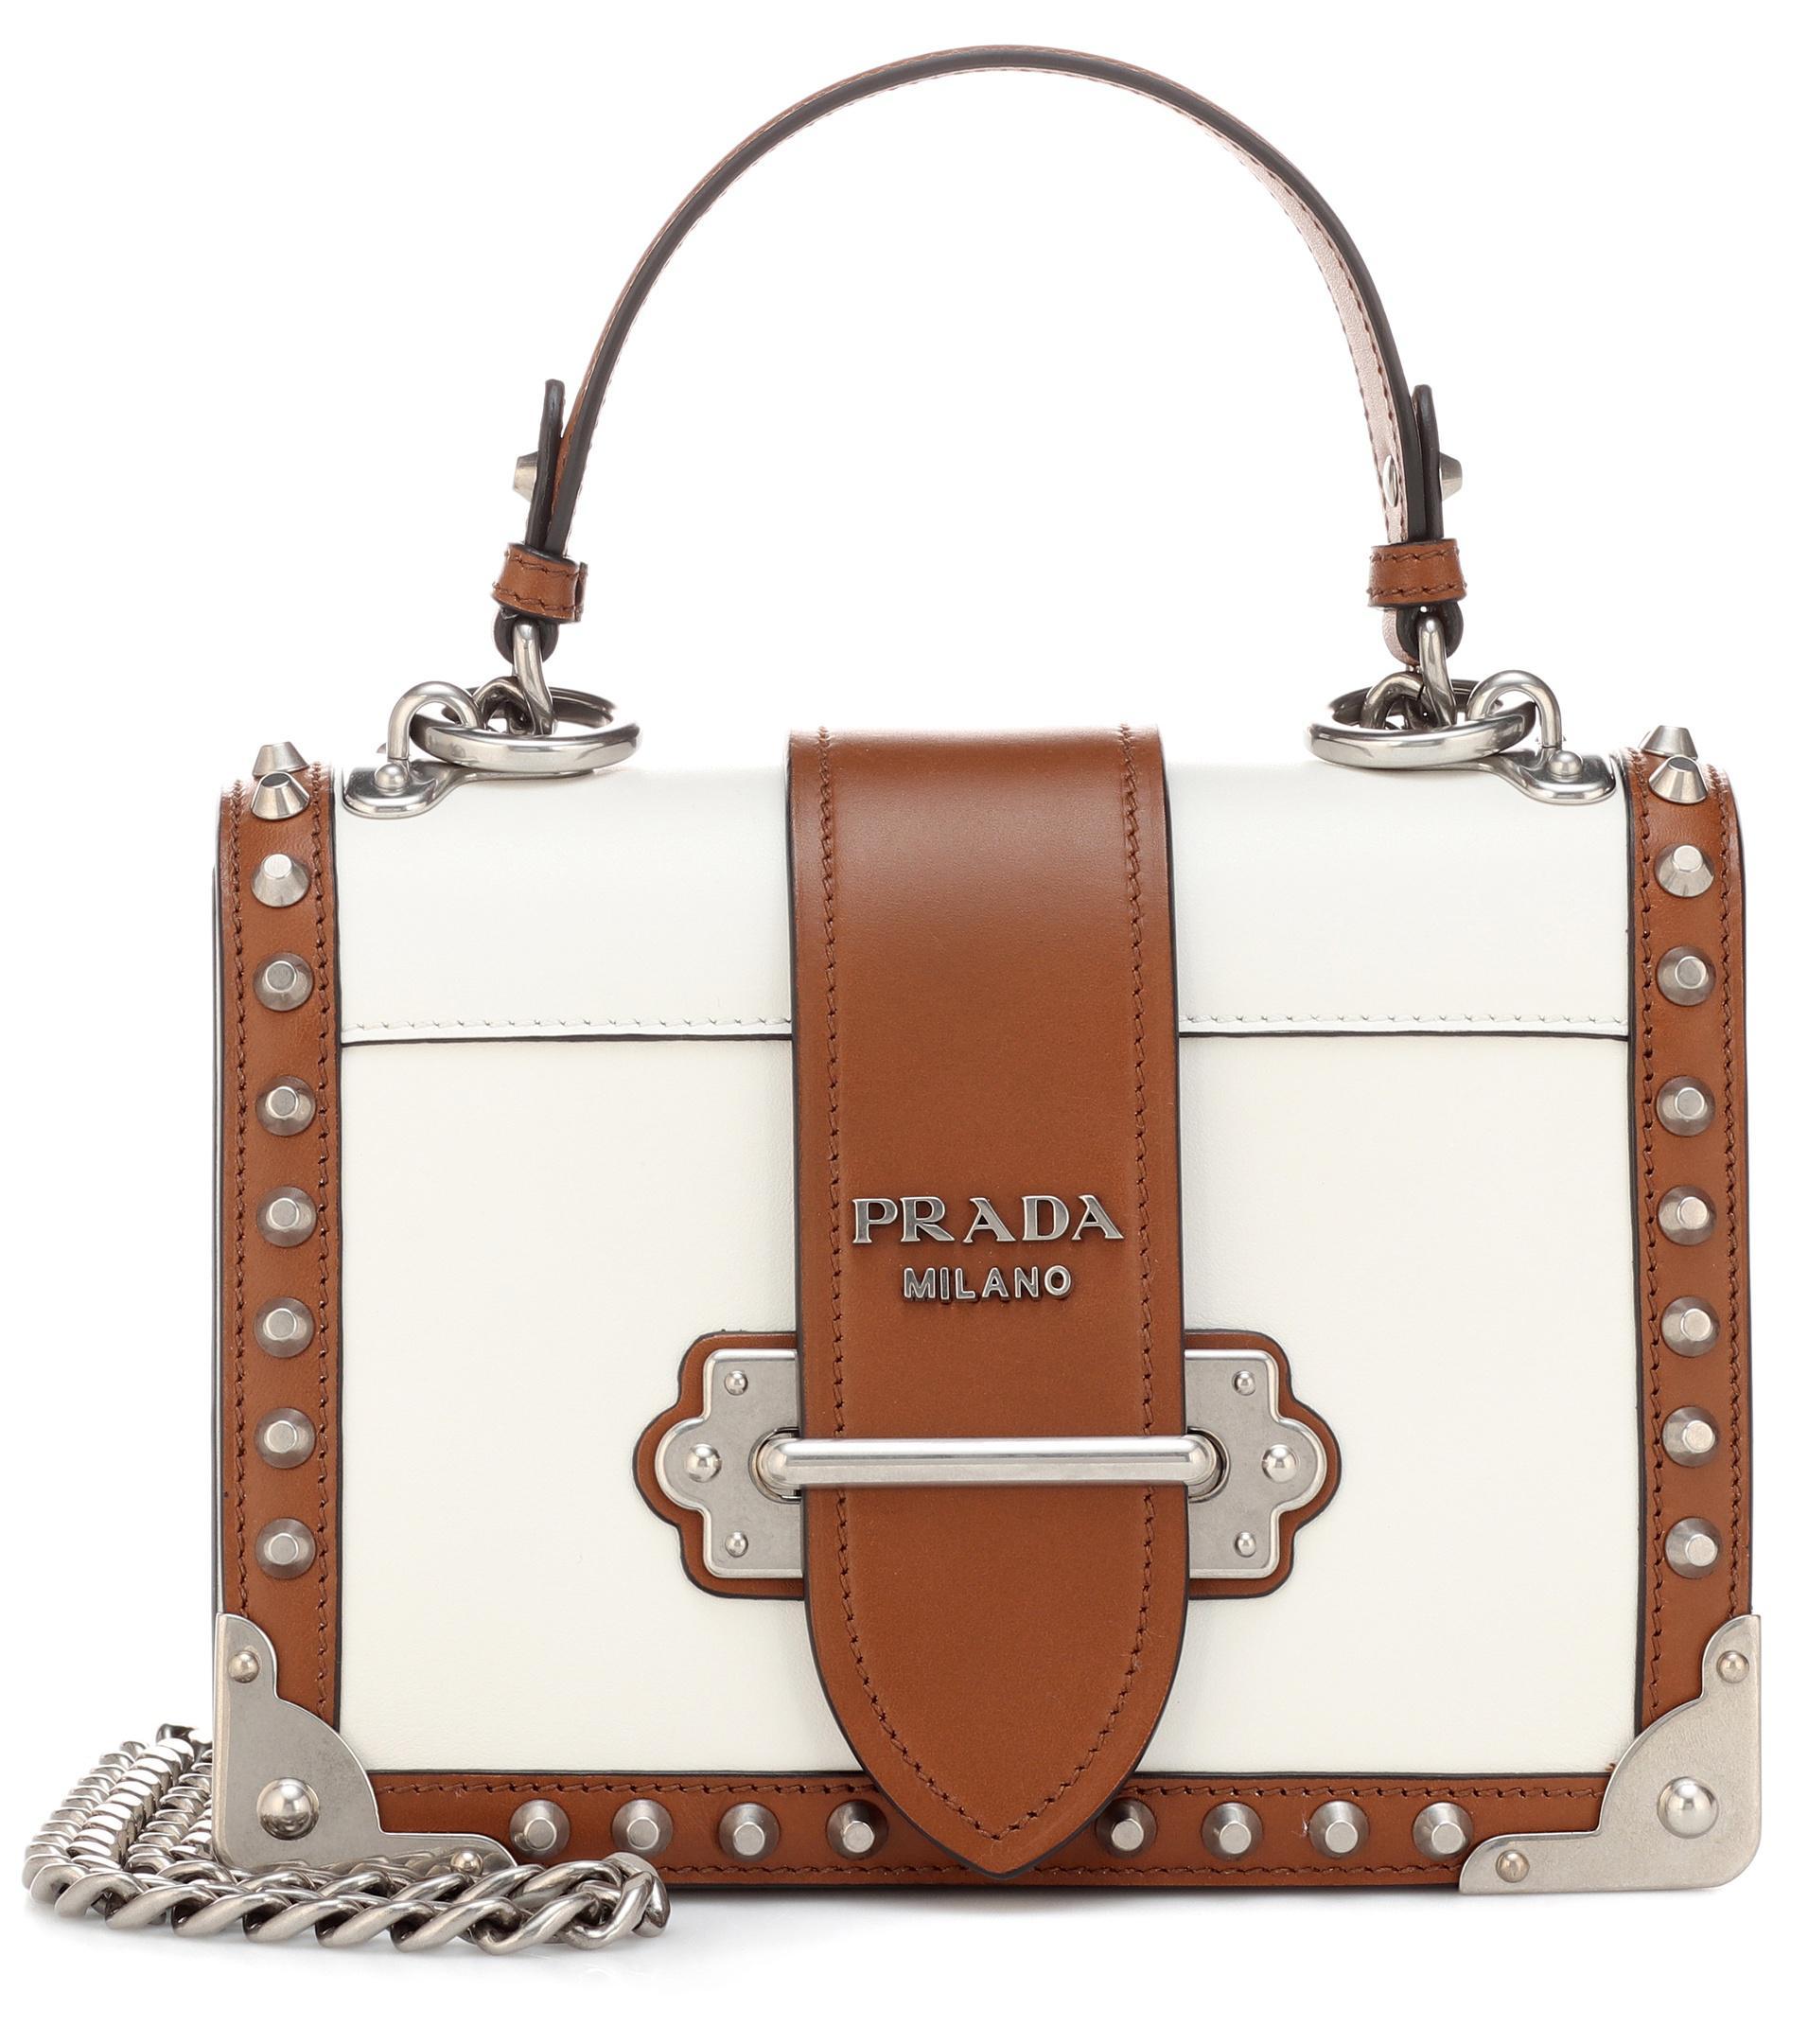 Prada Cahier Leather Shoulder Bag in White - Lyst 46b1e12f0a2b5